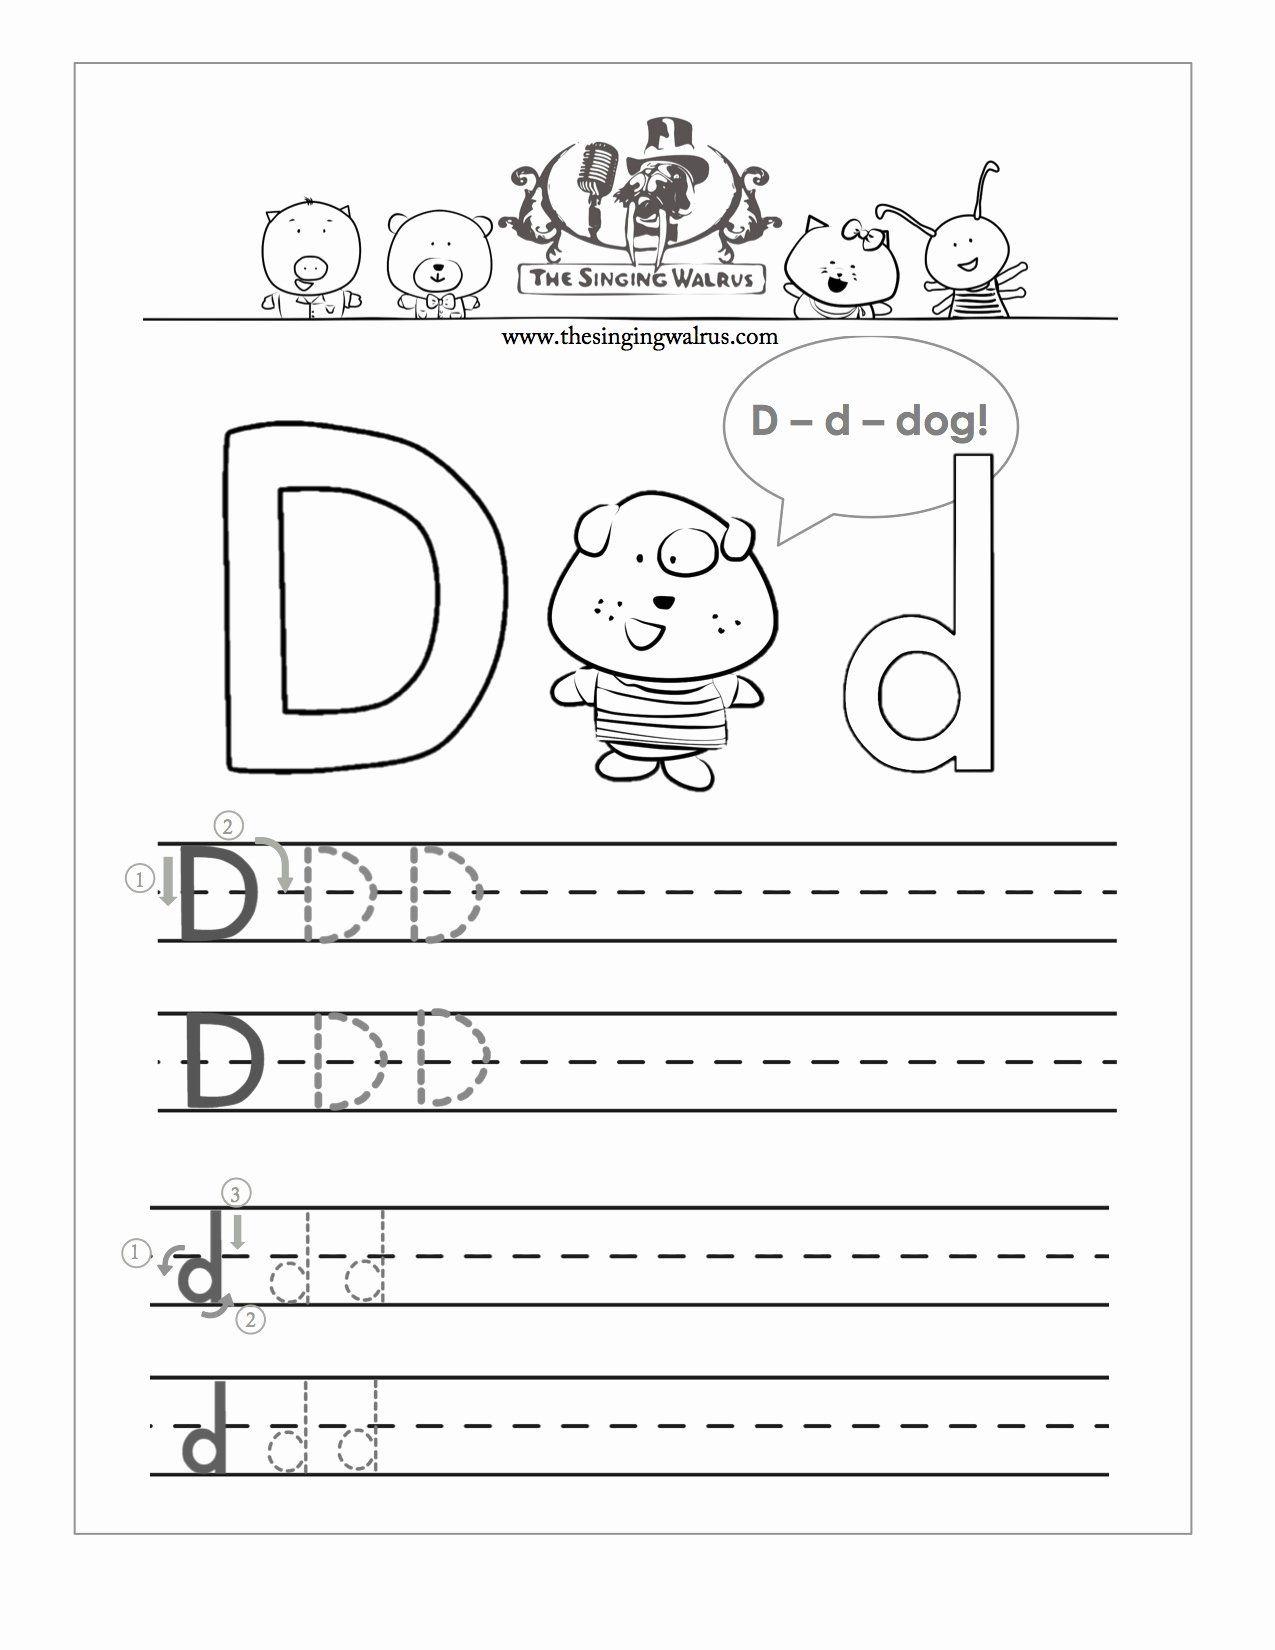 Letter D Worksheet For Preschool Luxury Free Handwriting